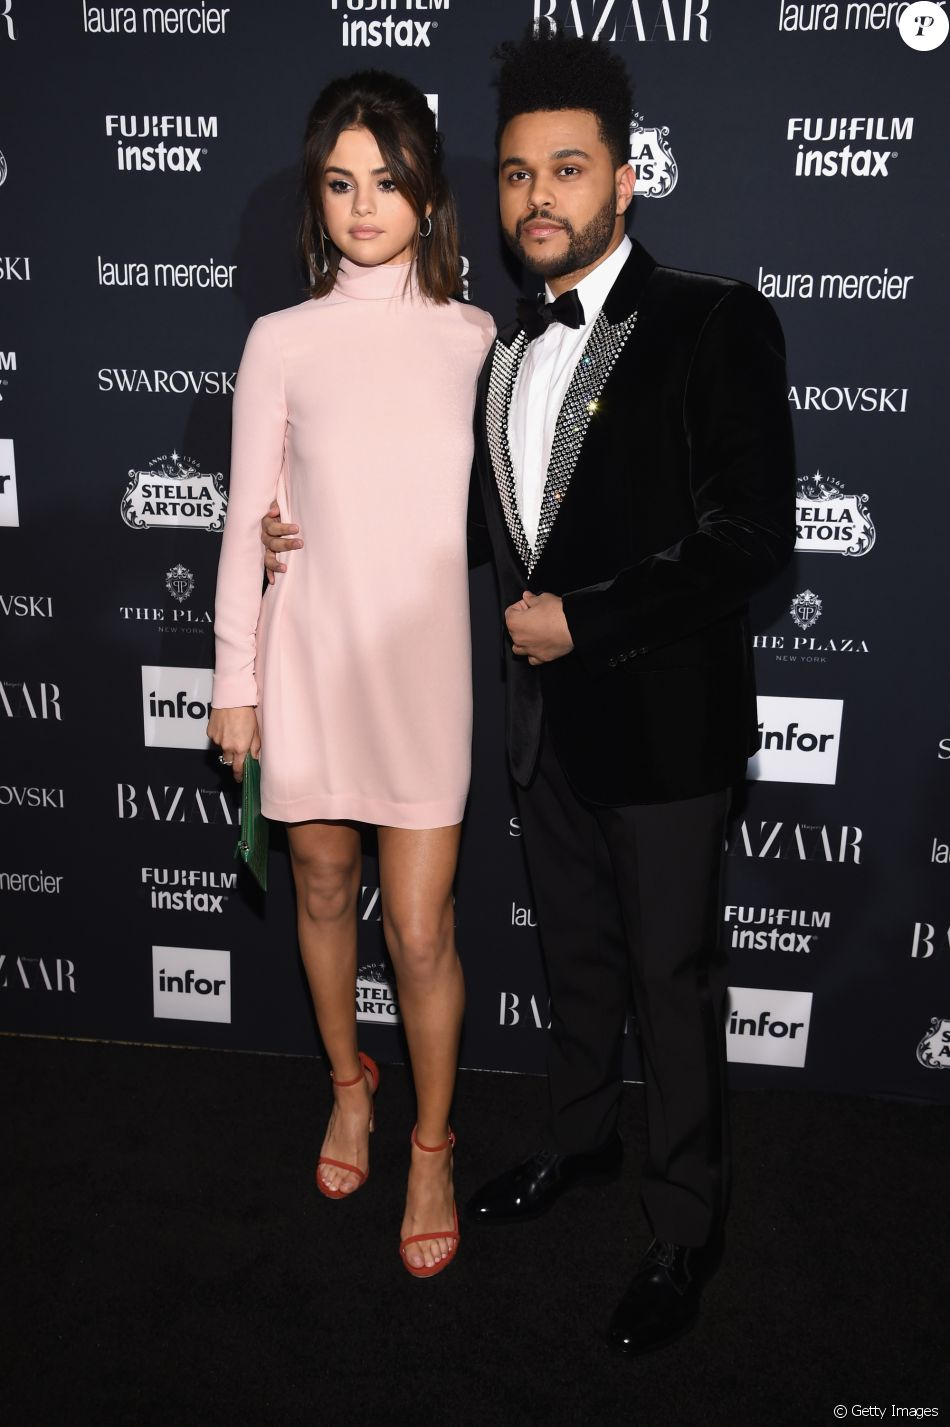 Selena Gomez e The Weeknd terminam namoro de 10 meses, de acordo com a revista 'People' nesta segunda-feira, dia 30 de outubro de 2017